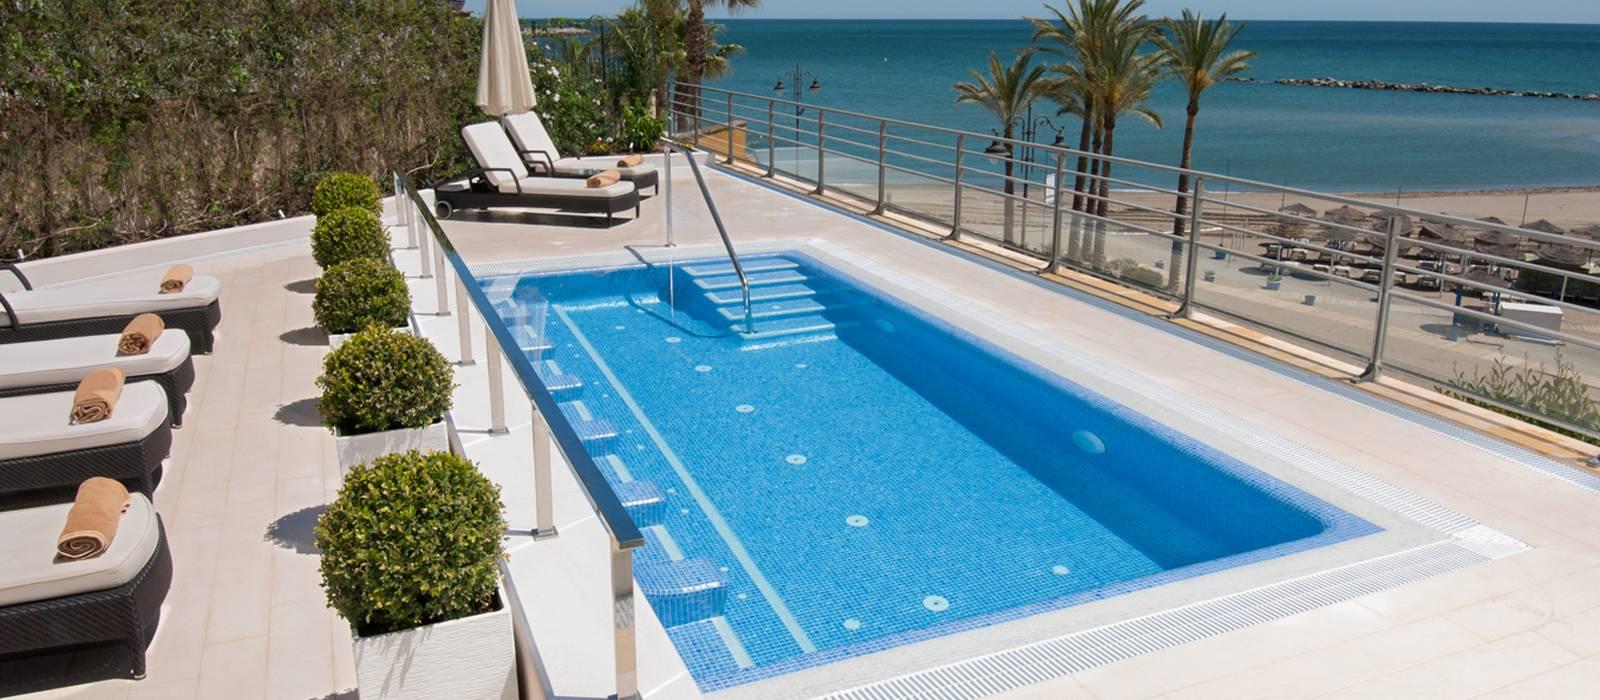 Hotel Vincci Aleysa Boutique&Spa - Pool und Freibad mit Hydromassage